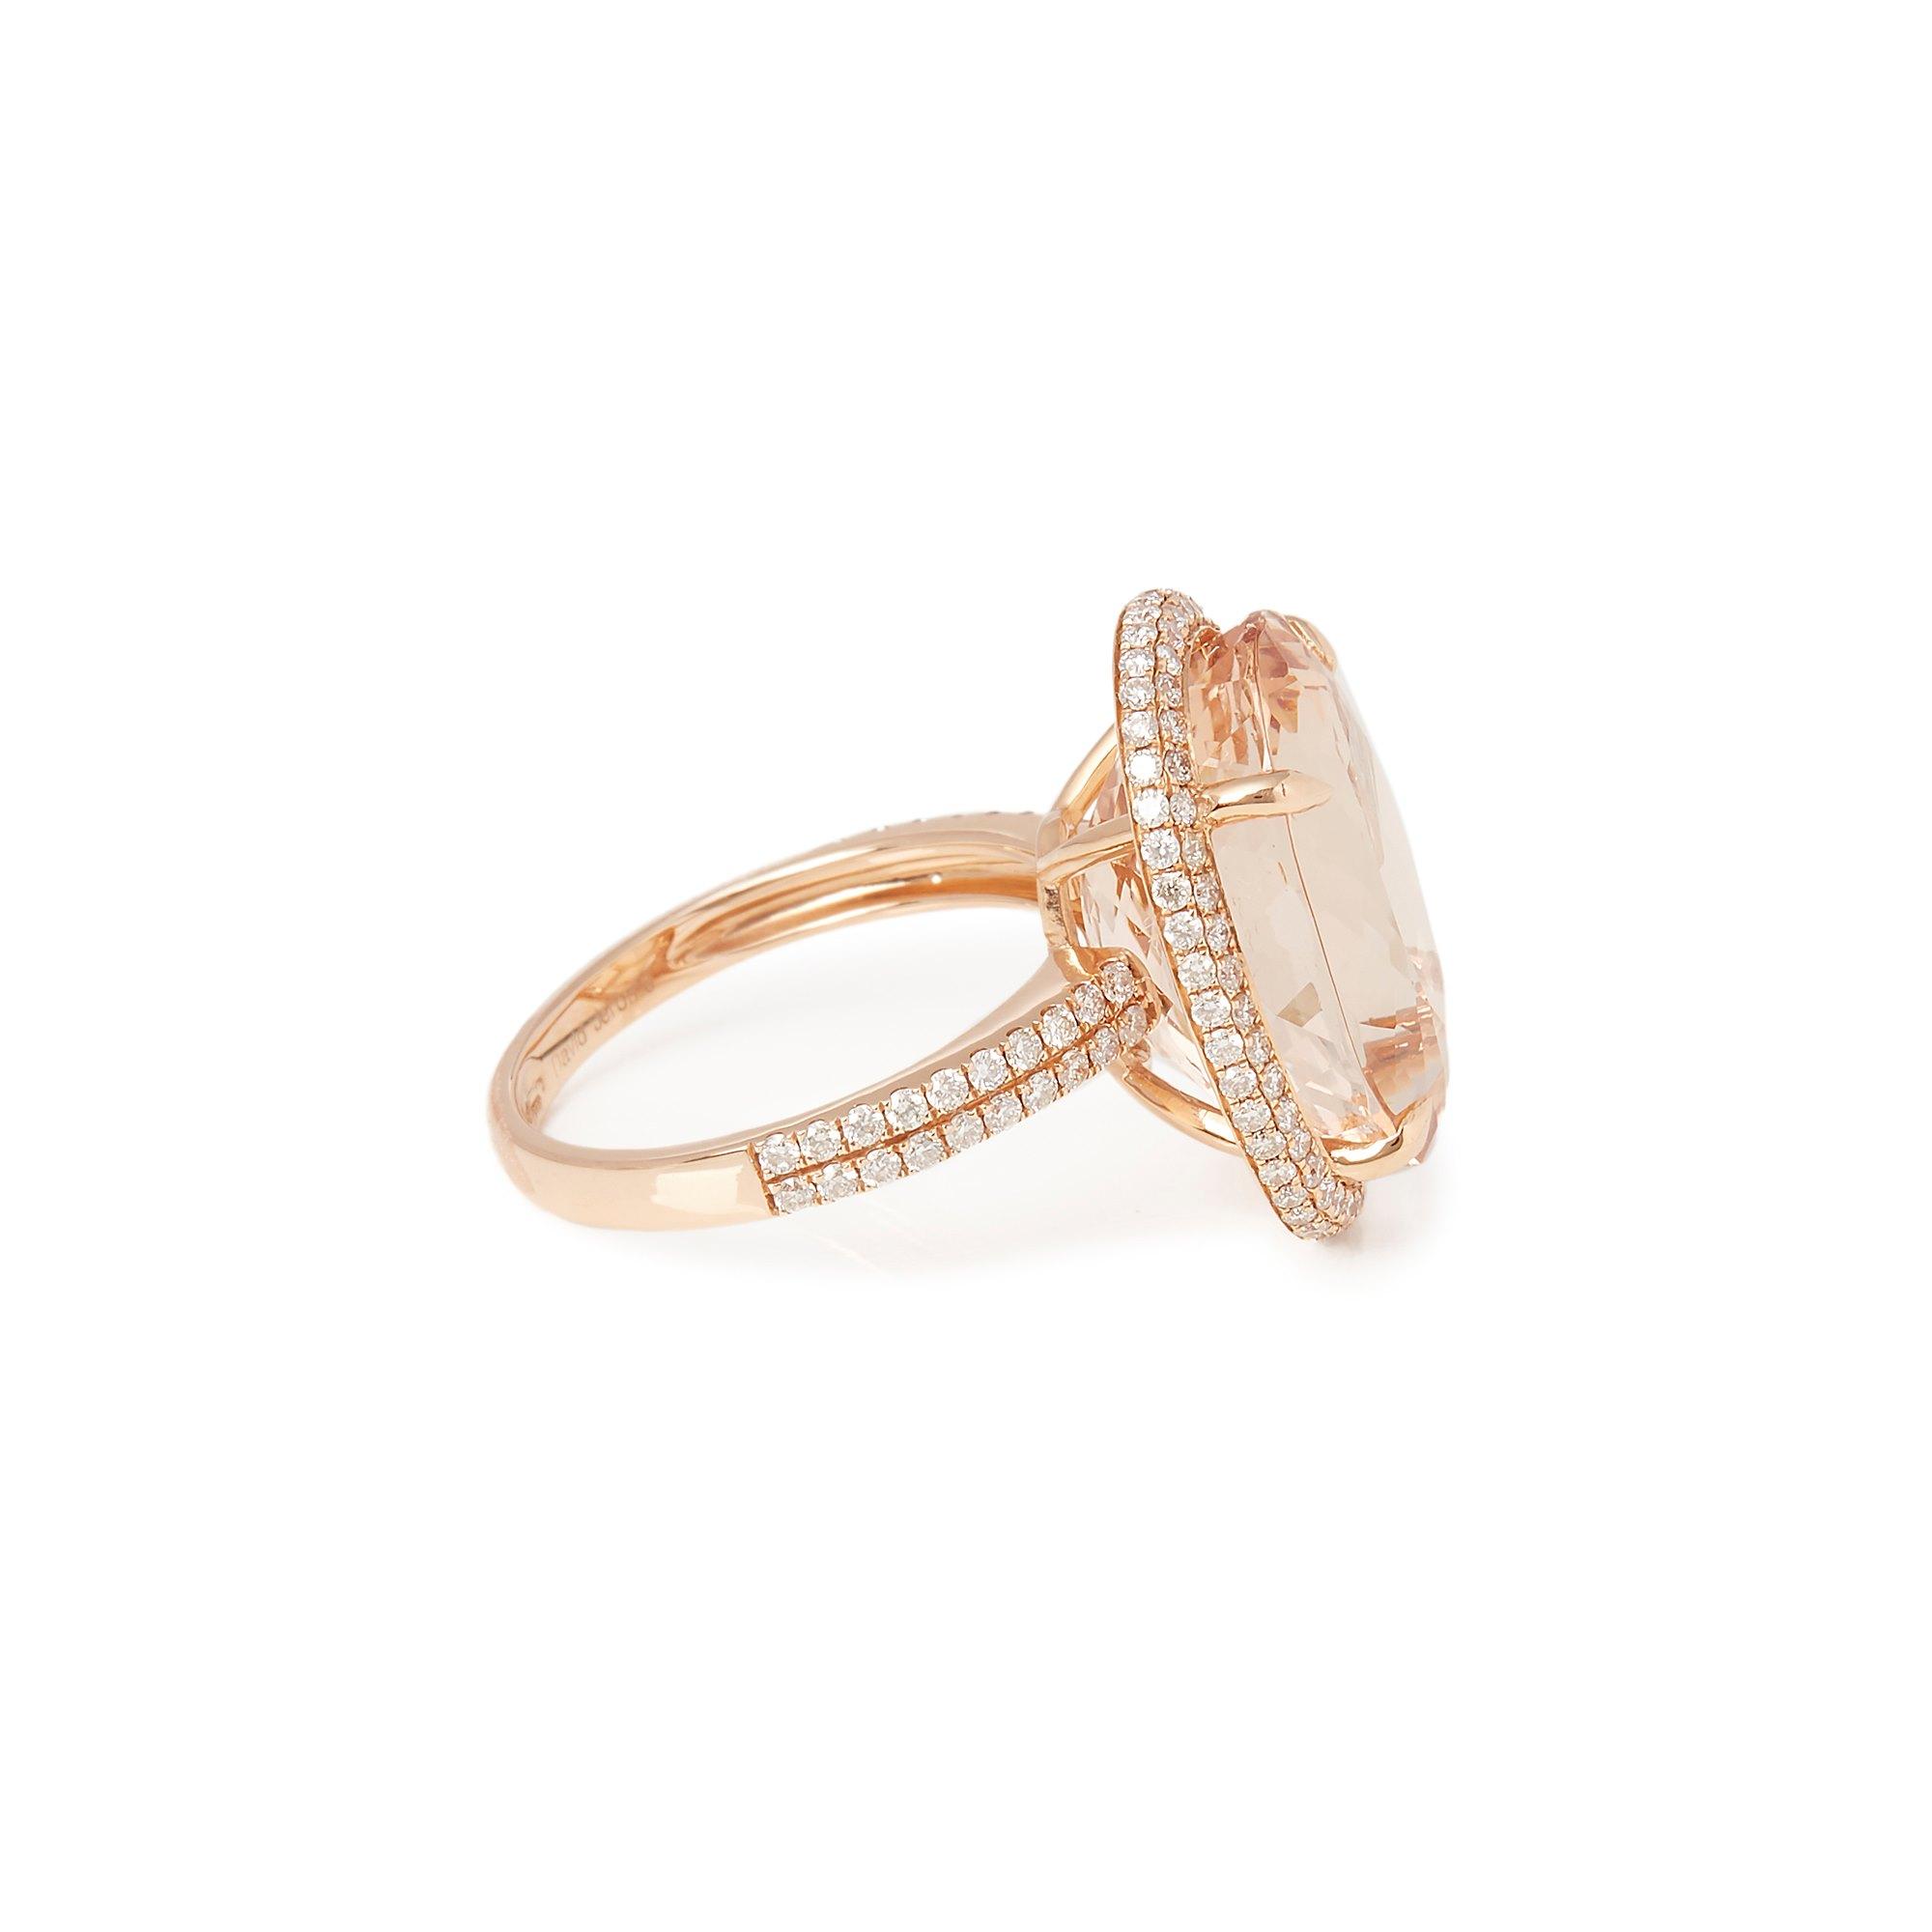 David Jerome Certified 14.31ct Brazilian Morganite and Diamond 18ct gold Ring